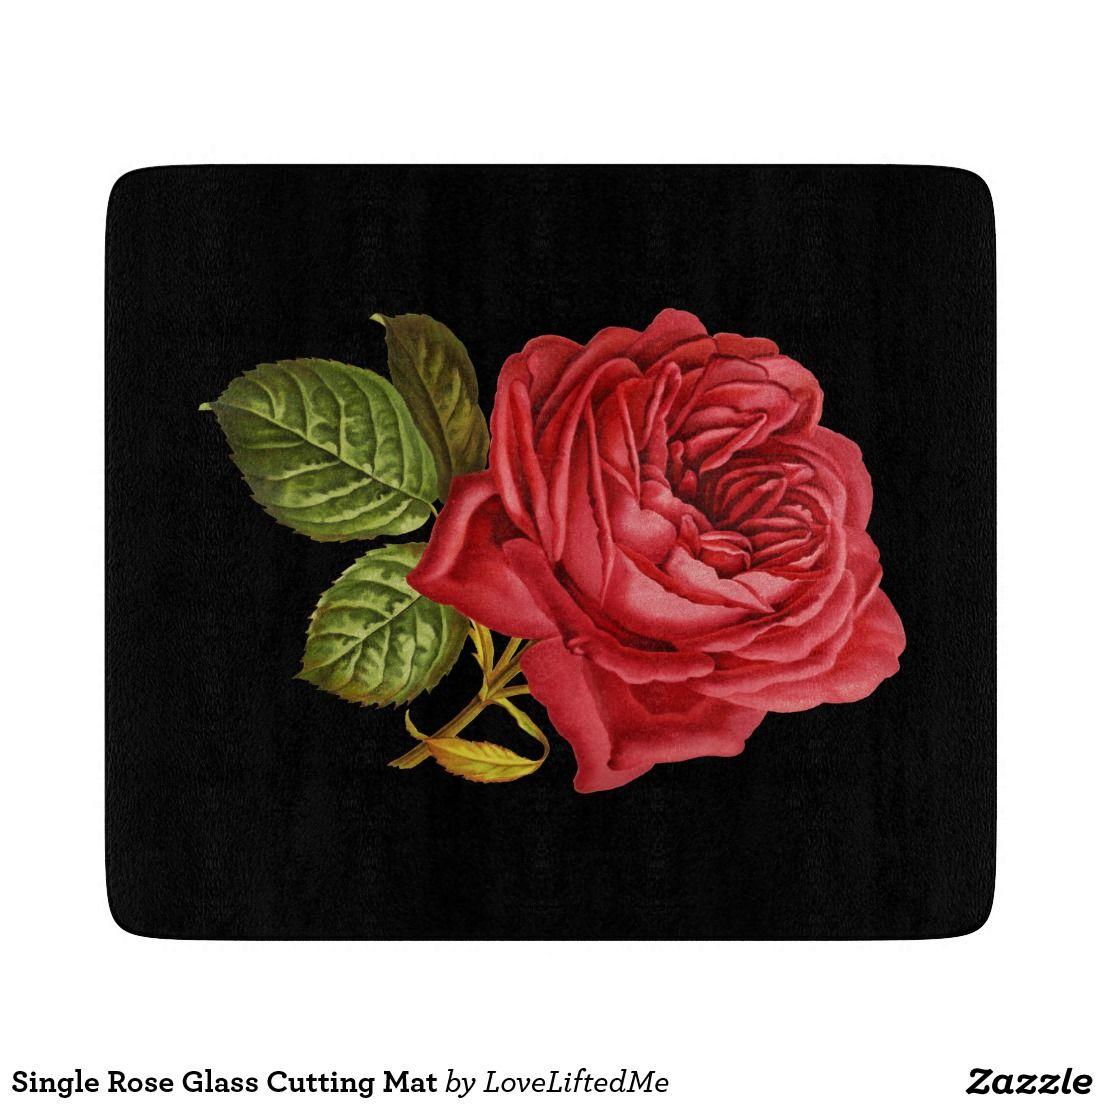 Single Rose Glass Cutting Mat